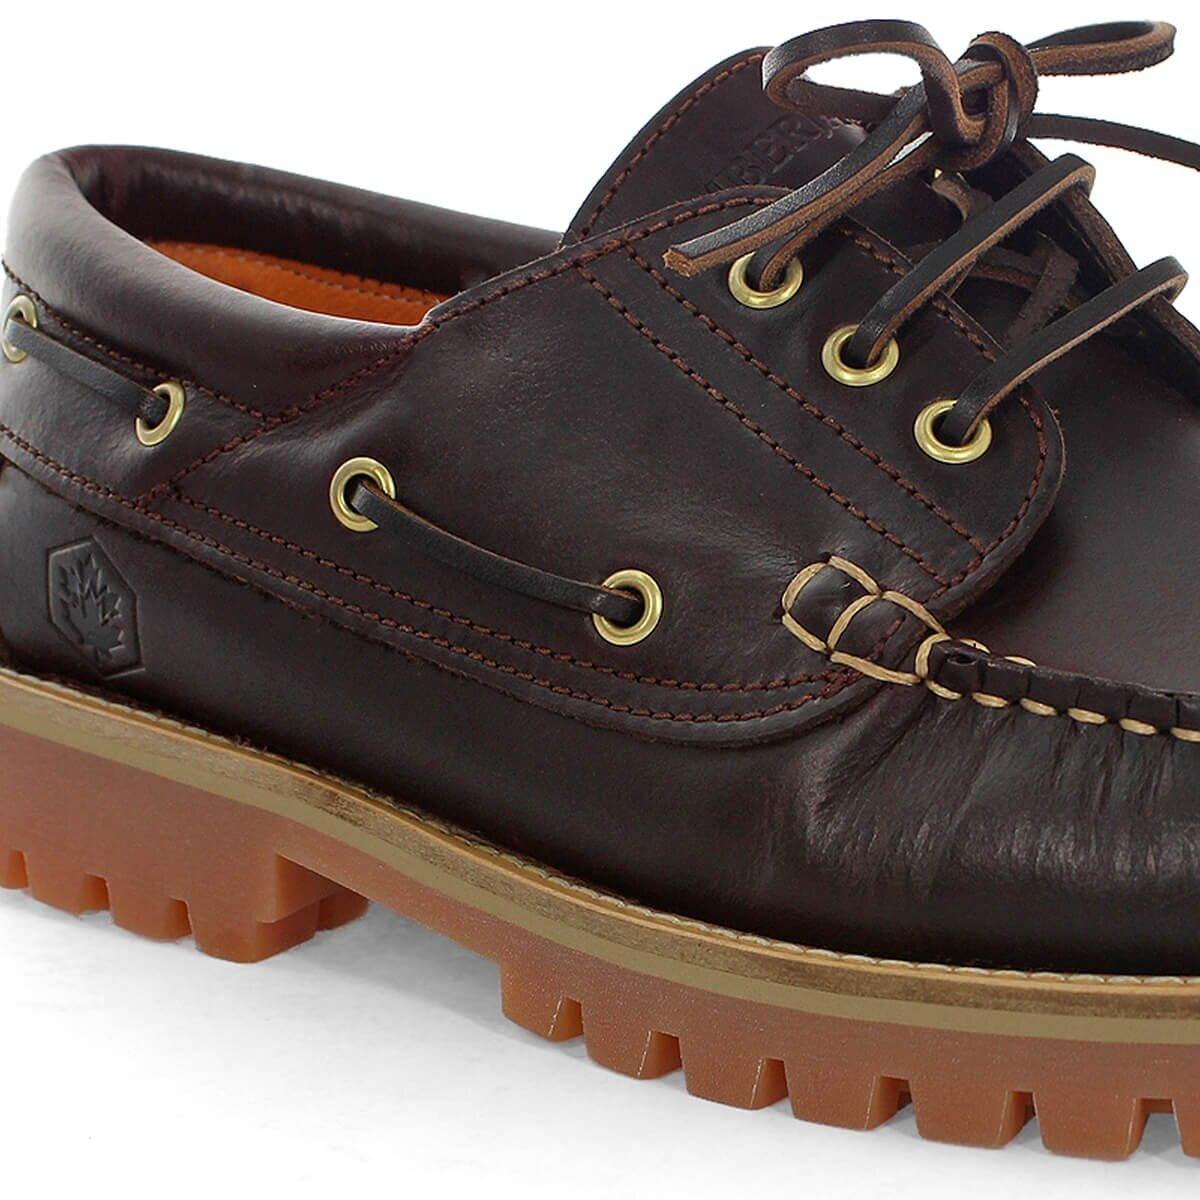 NEWMAN Boat shoes Man